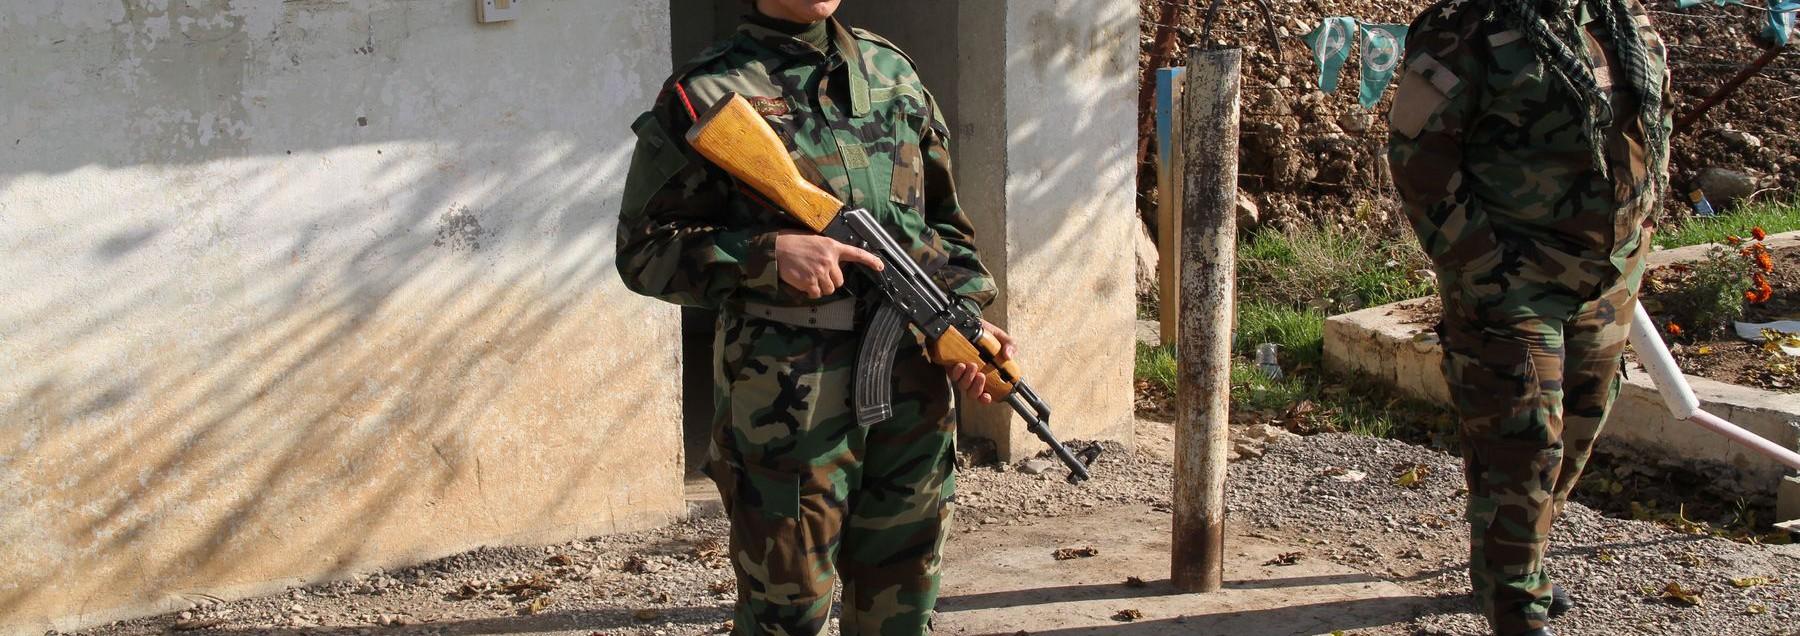 Le donne Peshmerga contro l'Isis